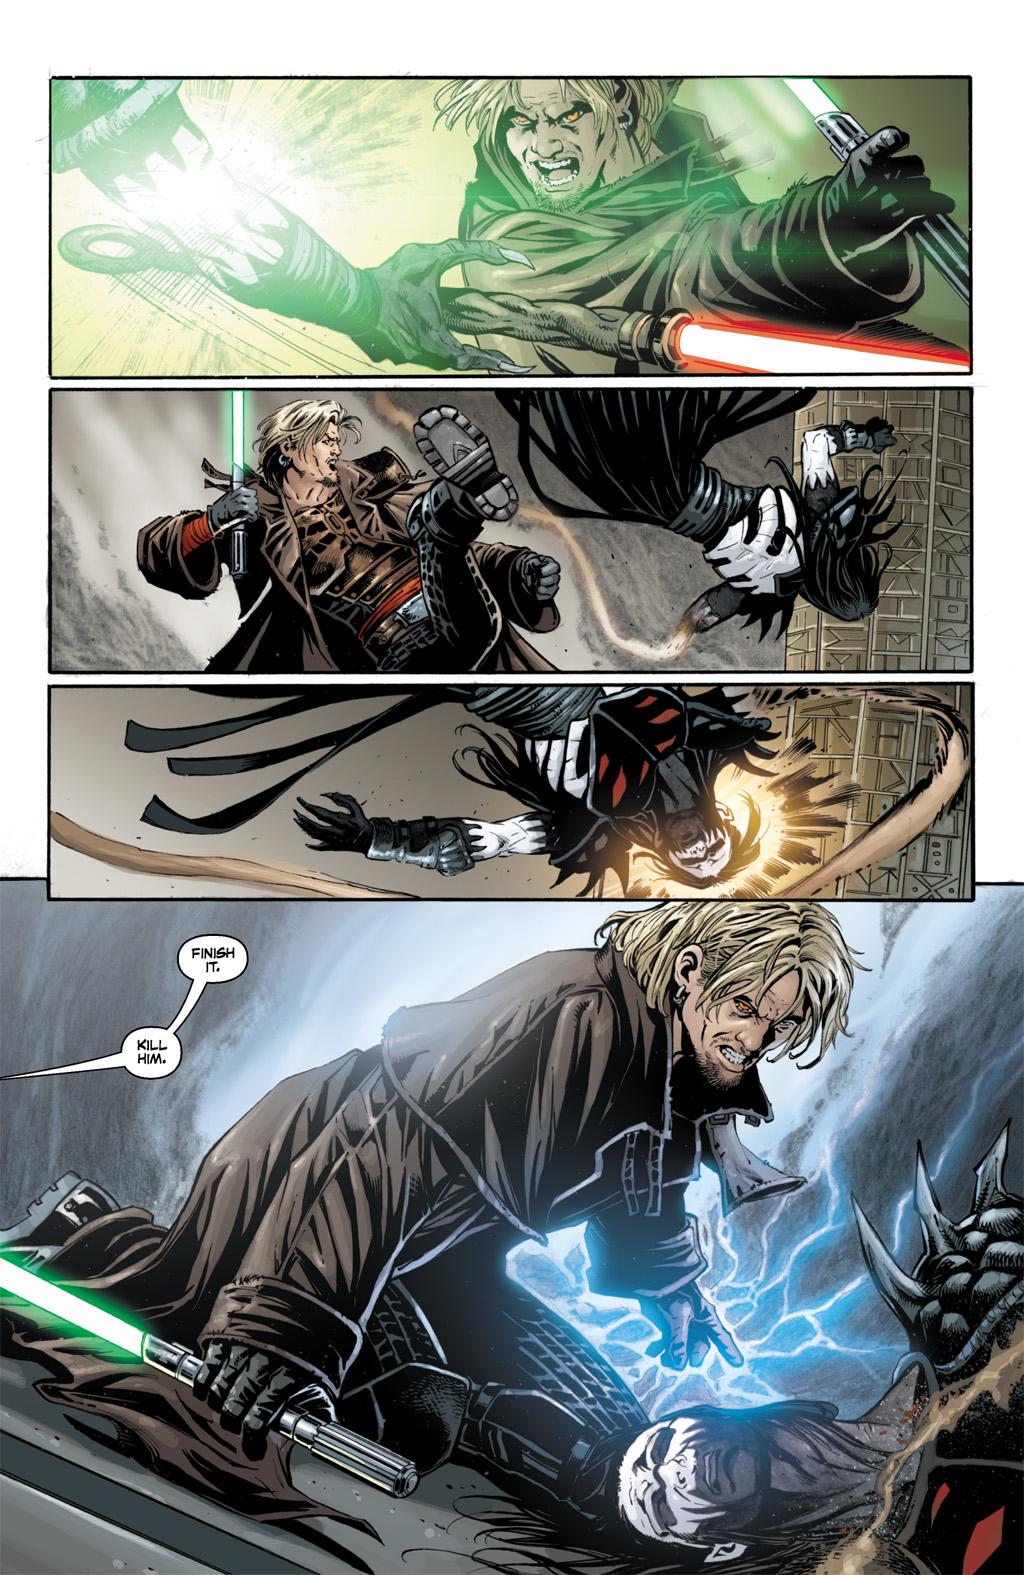 Comic-Only Fights Adapted To Novel Format F6r0GnN0pV0pRs6t-JIDF30sfqozZgz8AFrptIFrWkimTNiwTmbg0Uc1Xmi_NlAYz9RgV3-bW2VZ=s1600